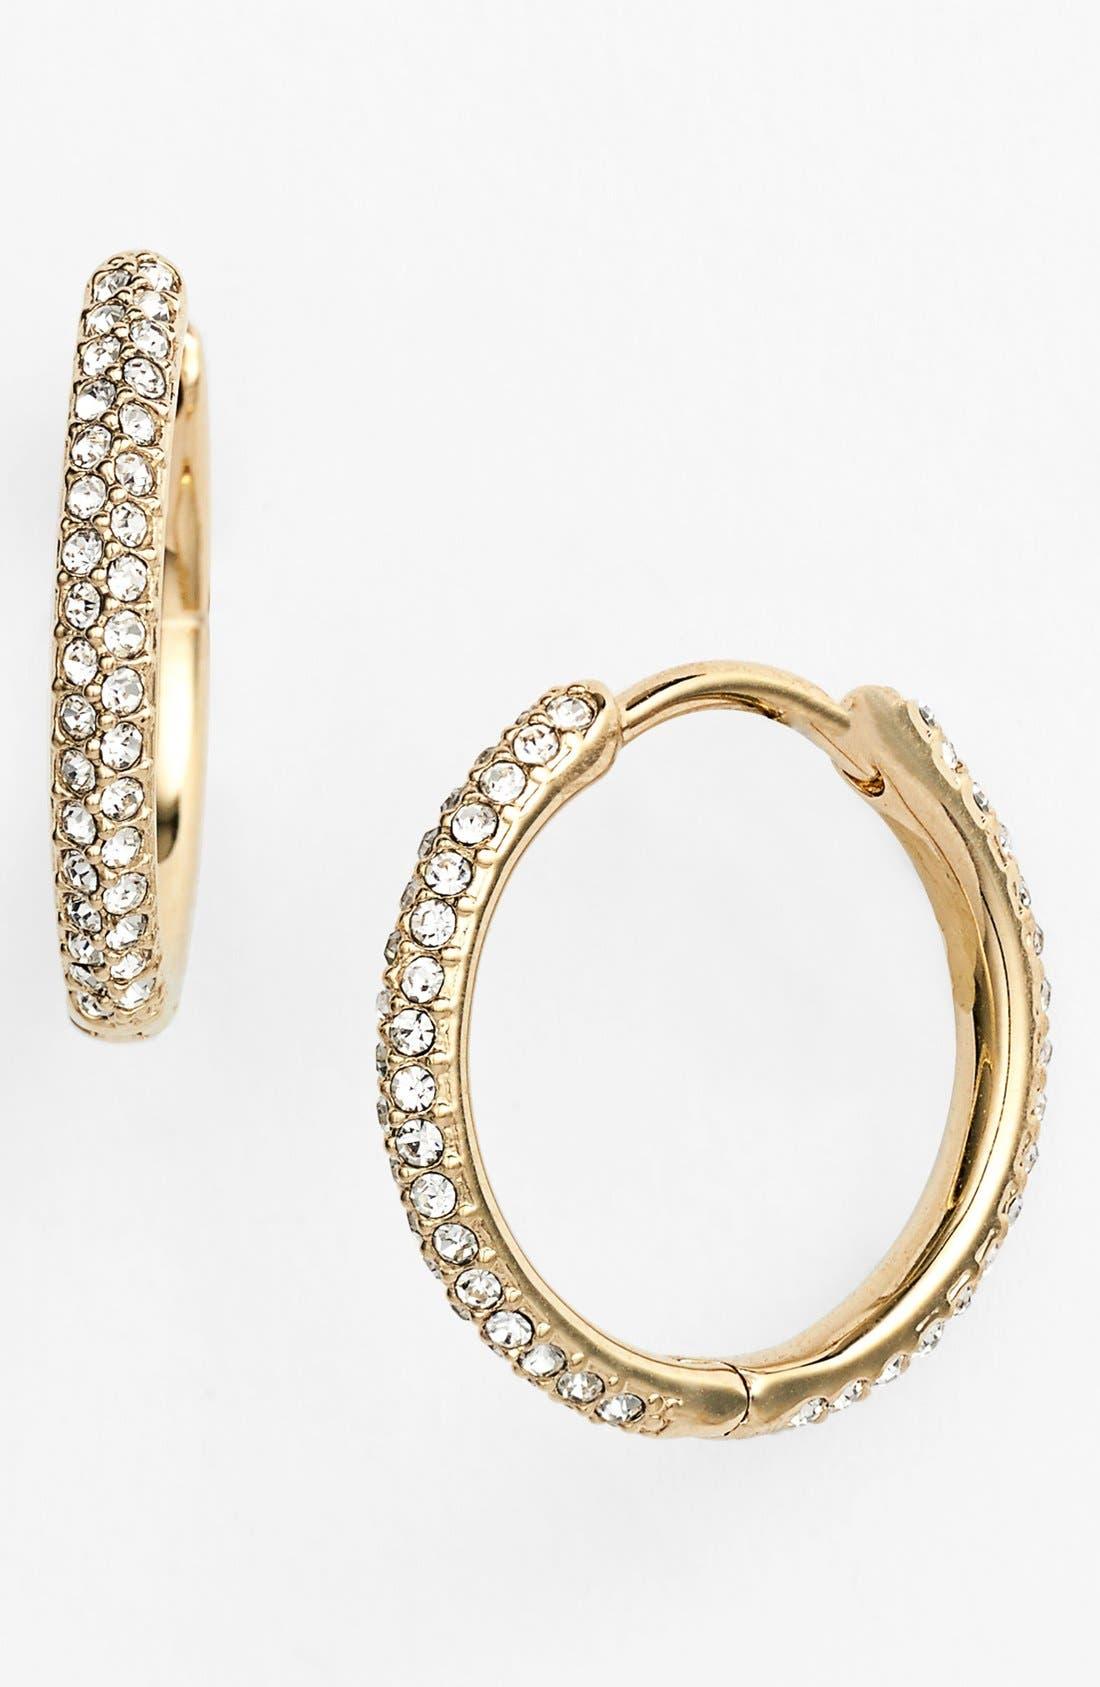 Small Pavé Hoop Earrings,                             Main thumbnail 1, color,                             GOLD/ CLEAR